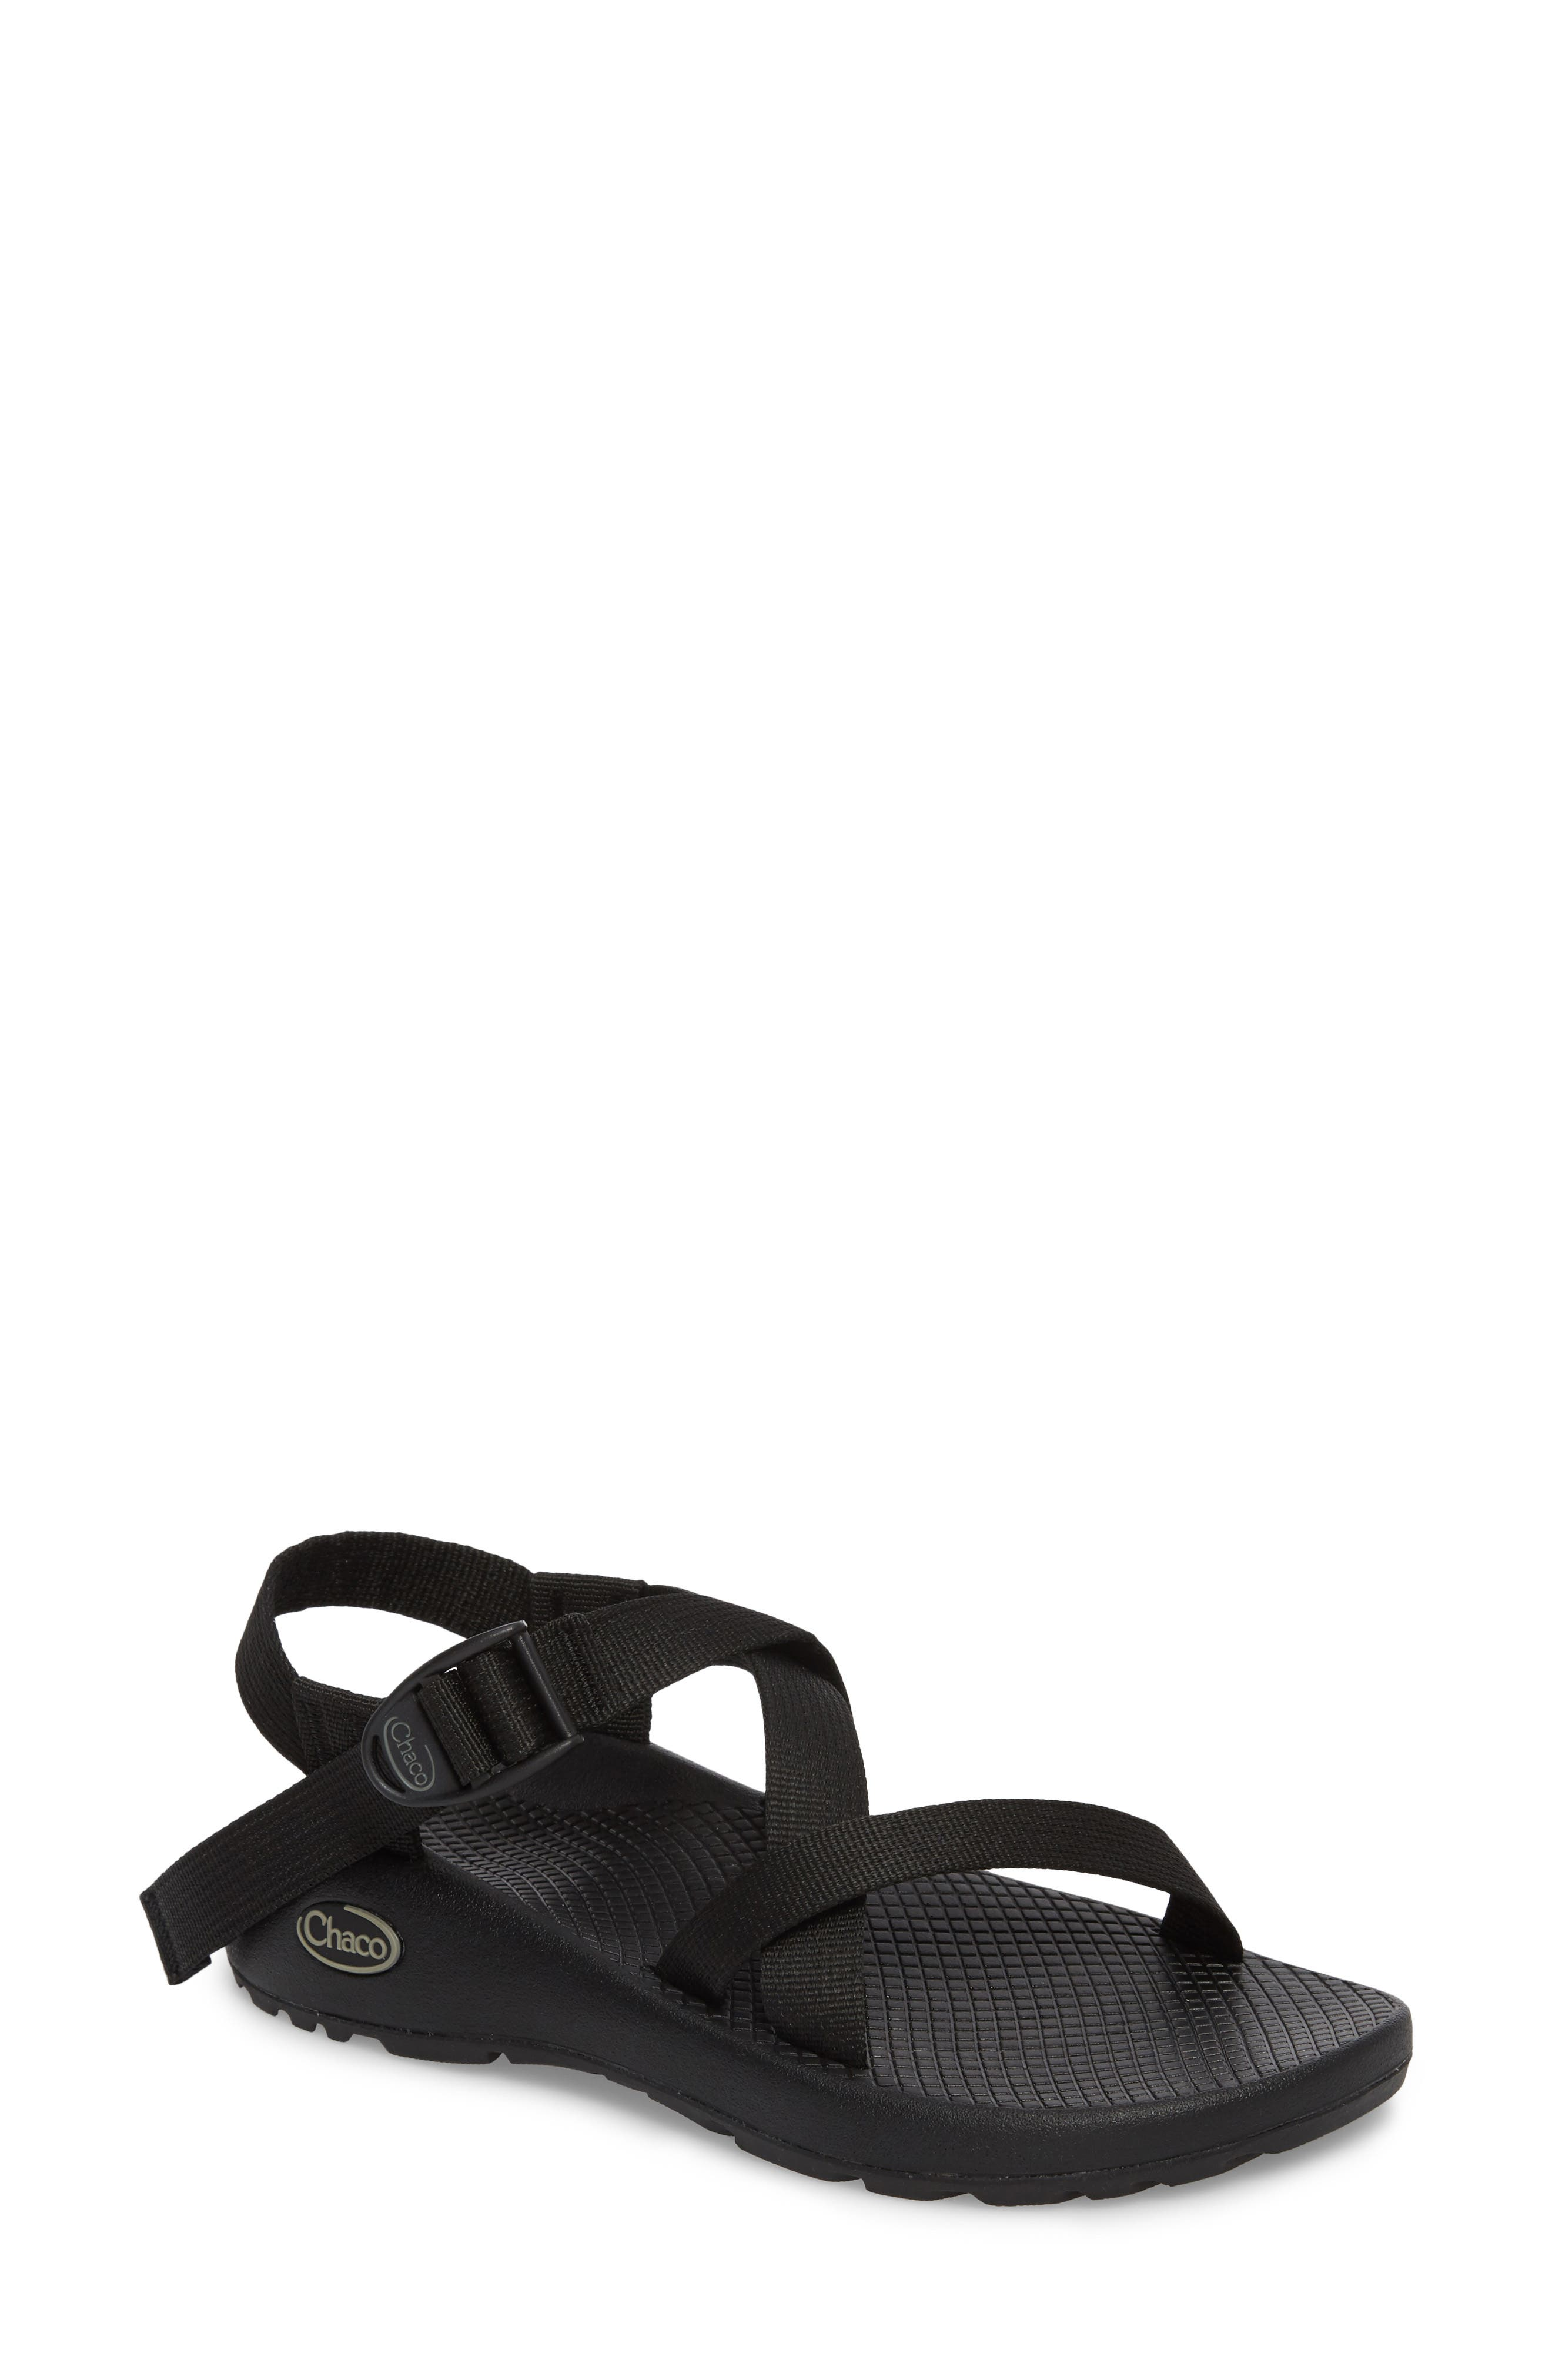 Z/1 Classic Sport Sandal,                             Main thumbnail 1, color,                             BLACK